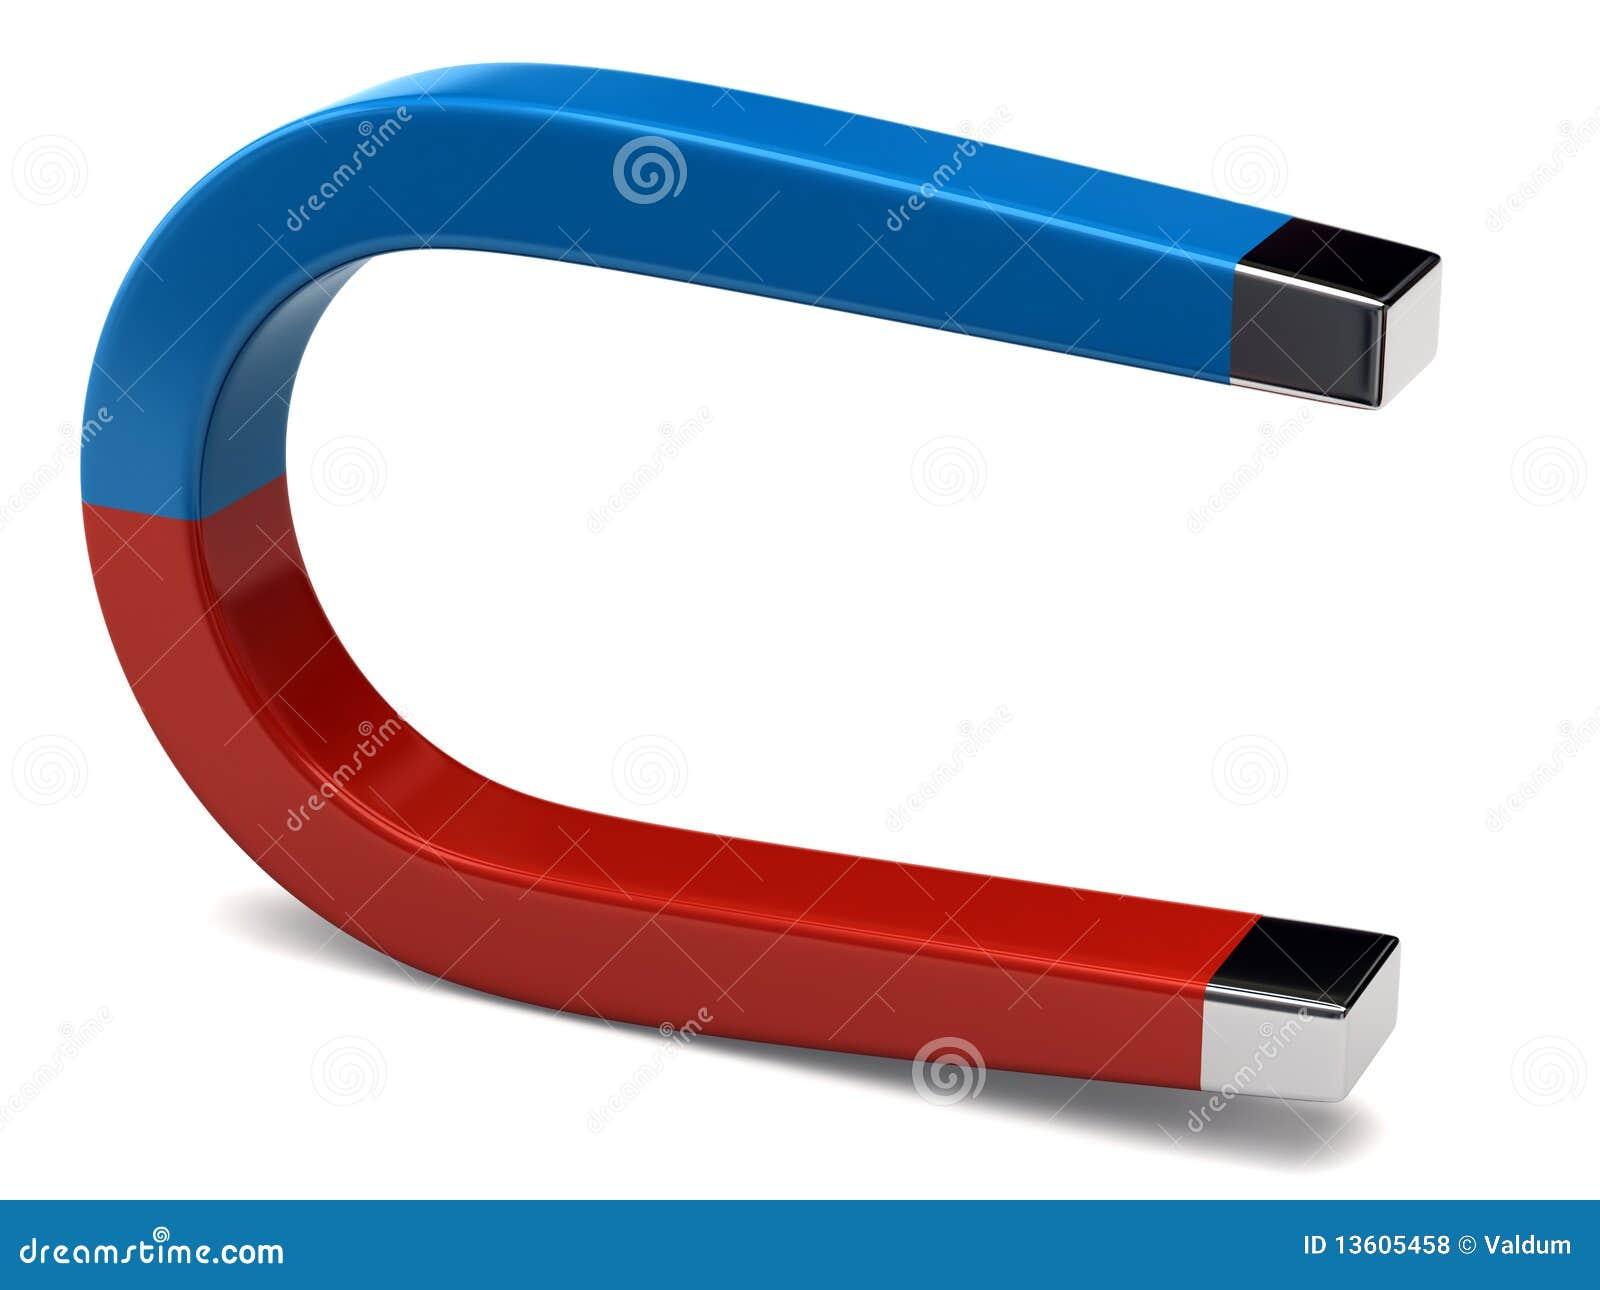 horseshoe magnet royalty free stock photos image 13605458 Horshoe Magnet Disc Magnet Clip Art